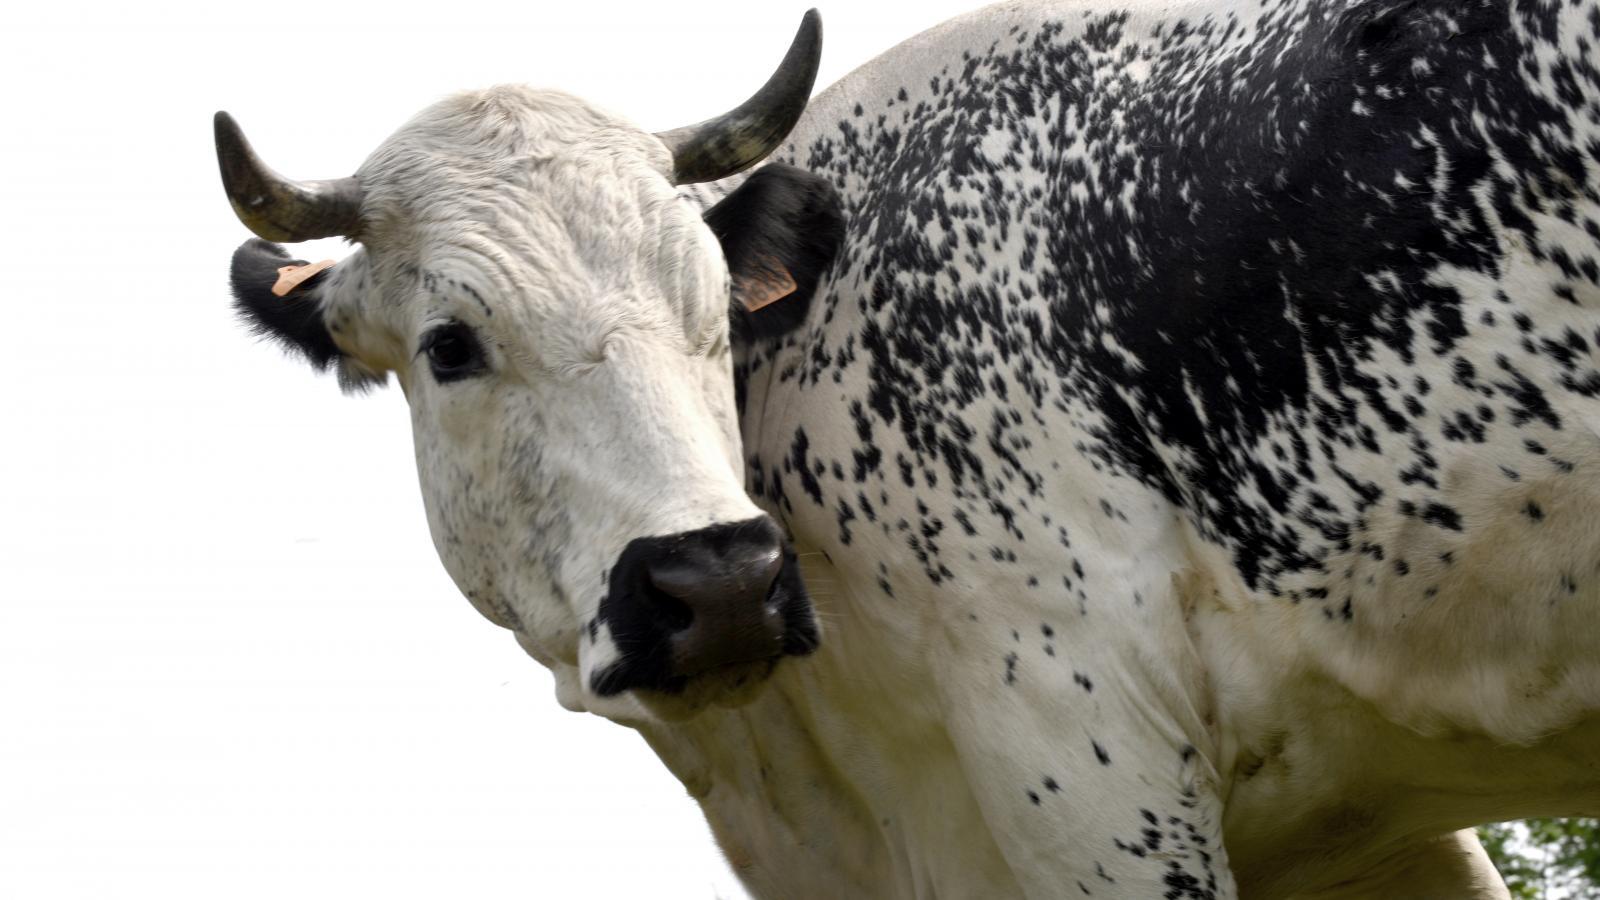 Vache de la ferme du Saichy u00e0 La Bresse